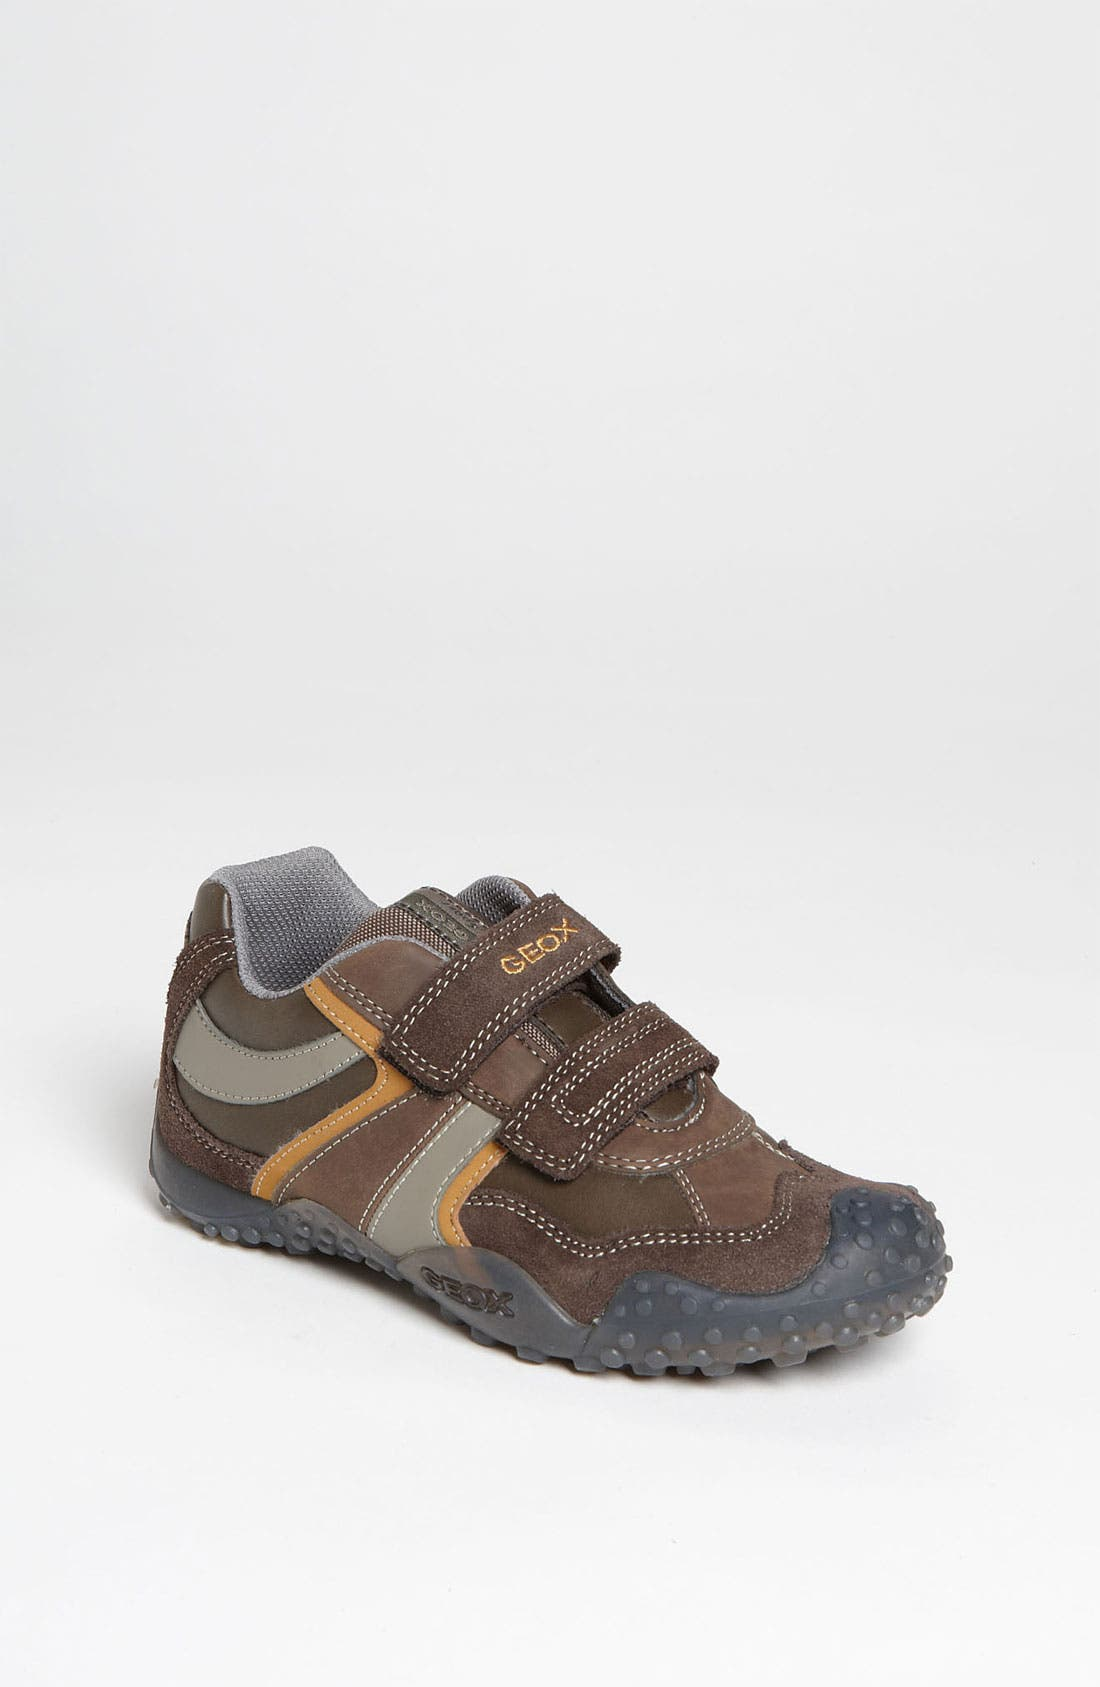 Main Image - Geox 'Giant' Sneaker (Toddler, Little Kid & Big Kid)